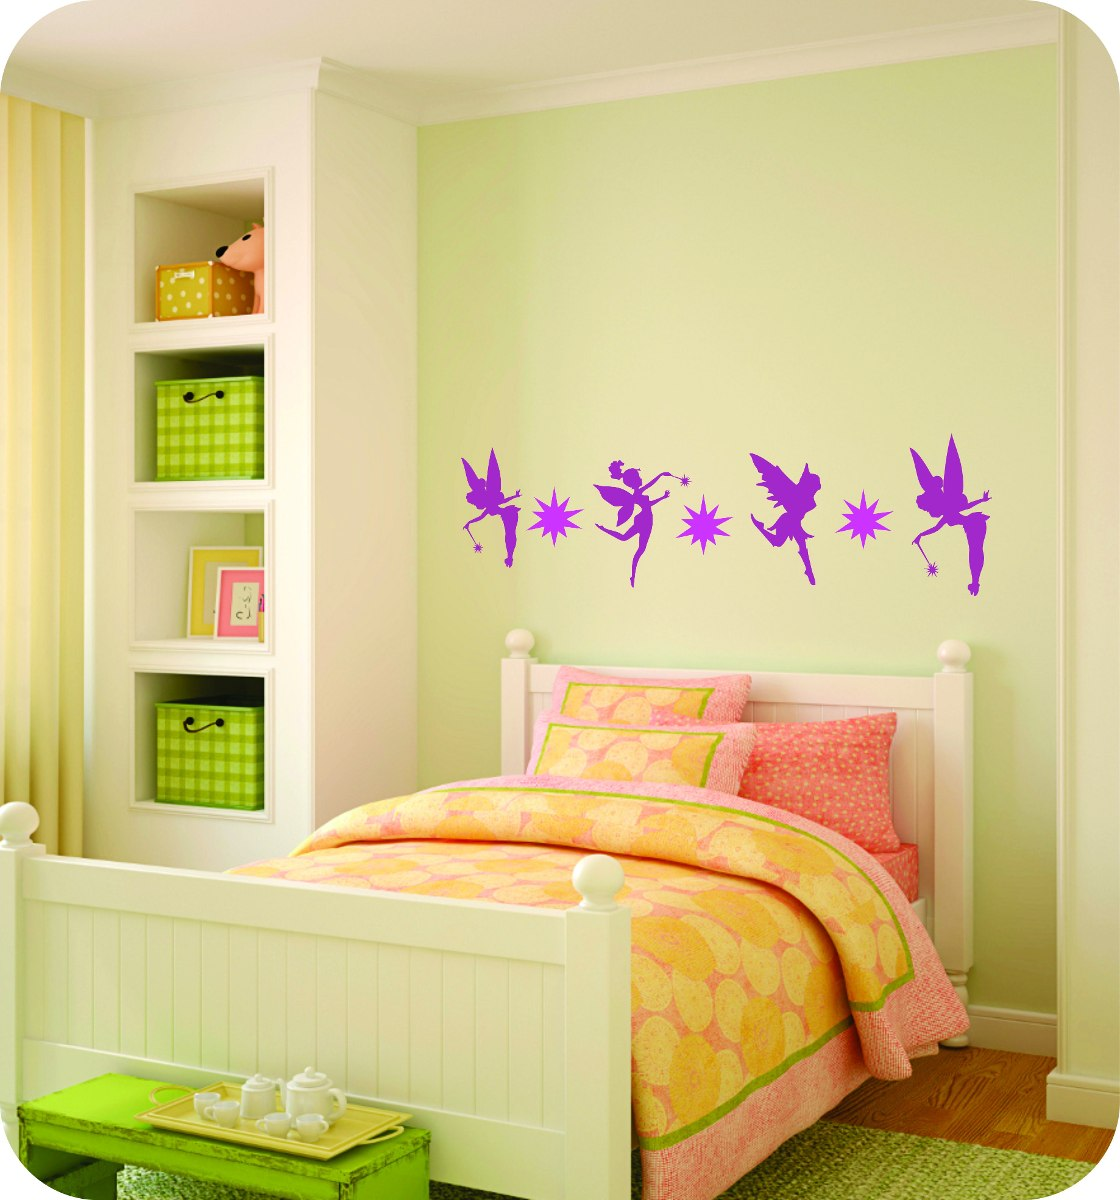 Decoracion de cuarto awesome ideas para decorar el cuarto for Cuartos para ninas decoracion